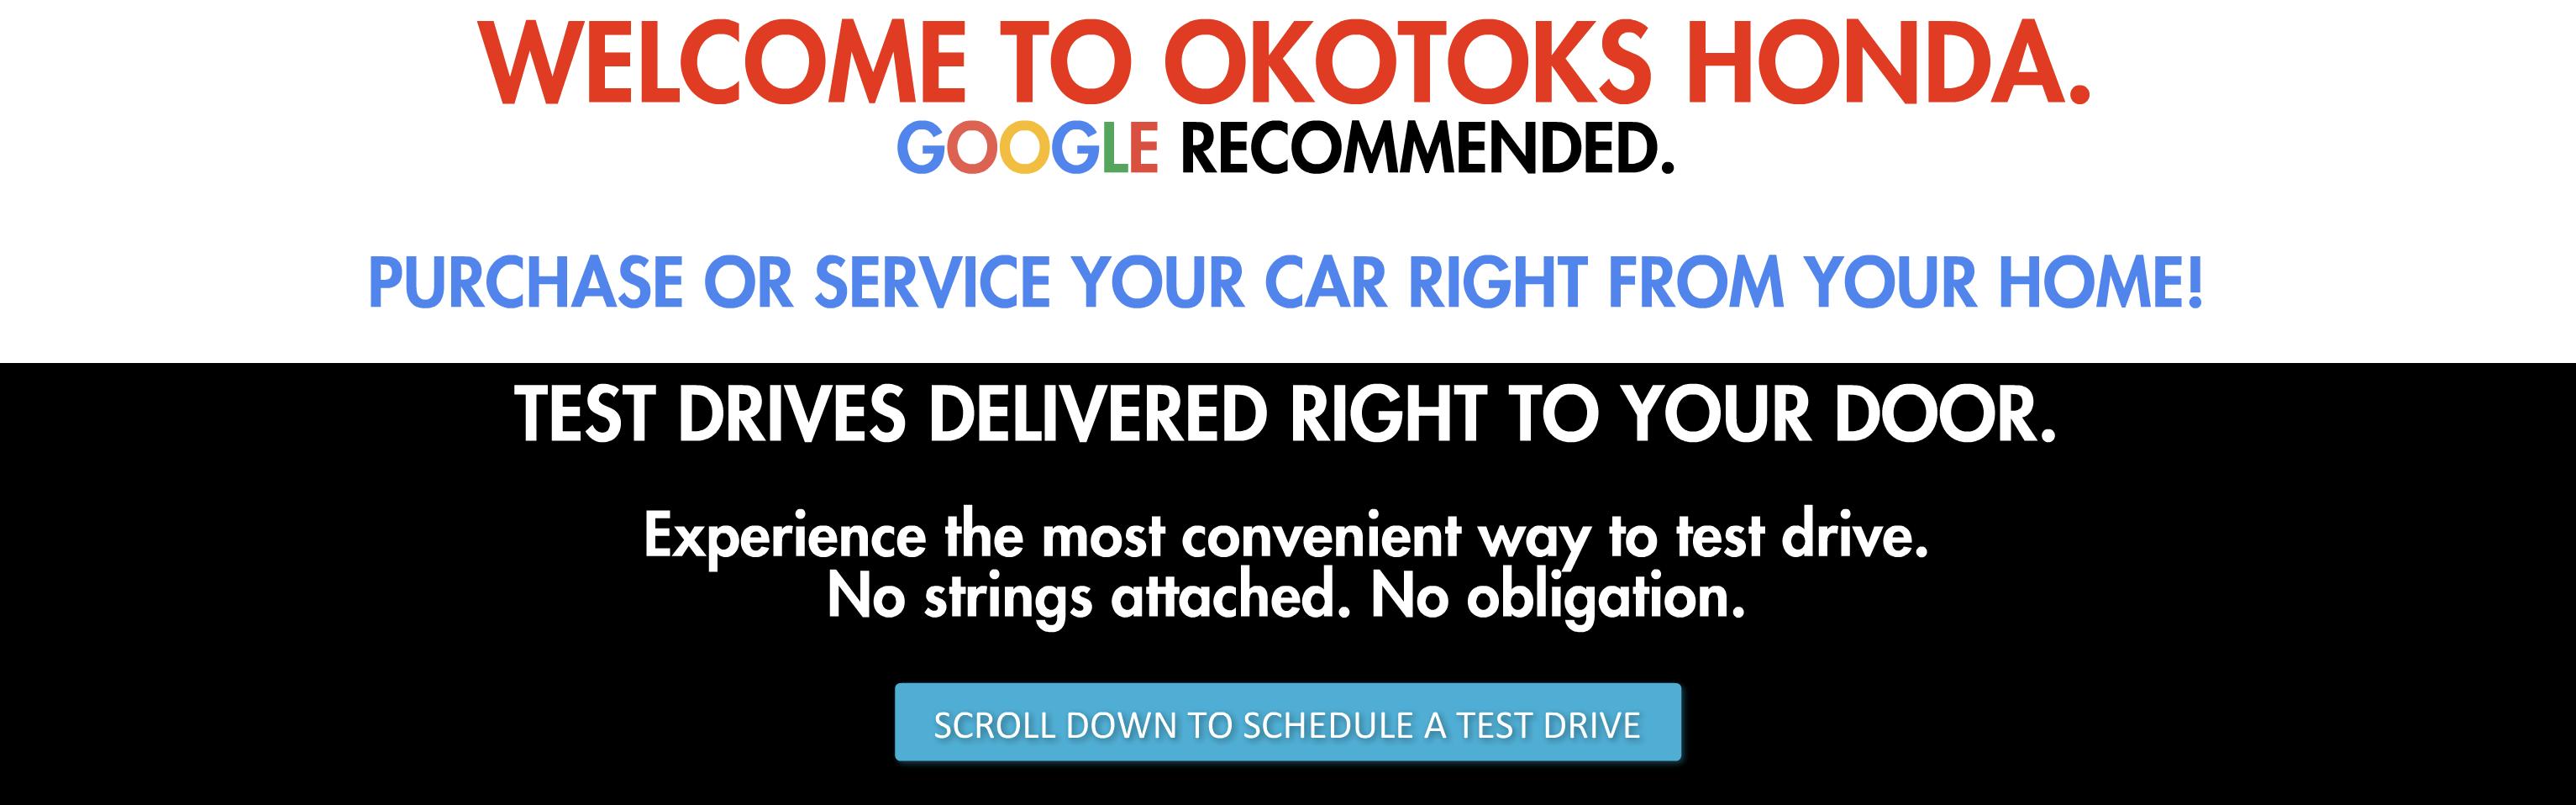 VIP Test Drive a New or Used Car - Okotoks Honda, South Calgary